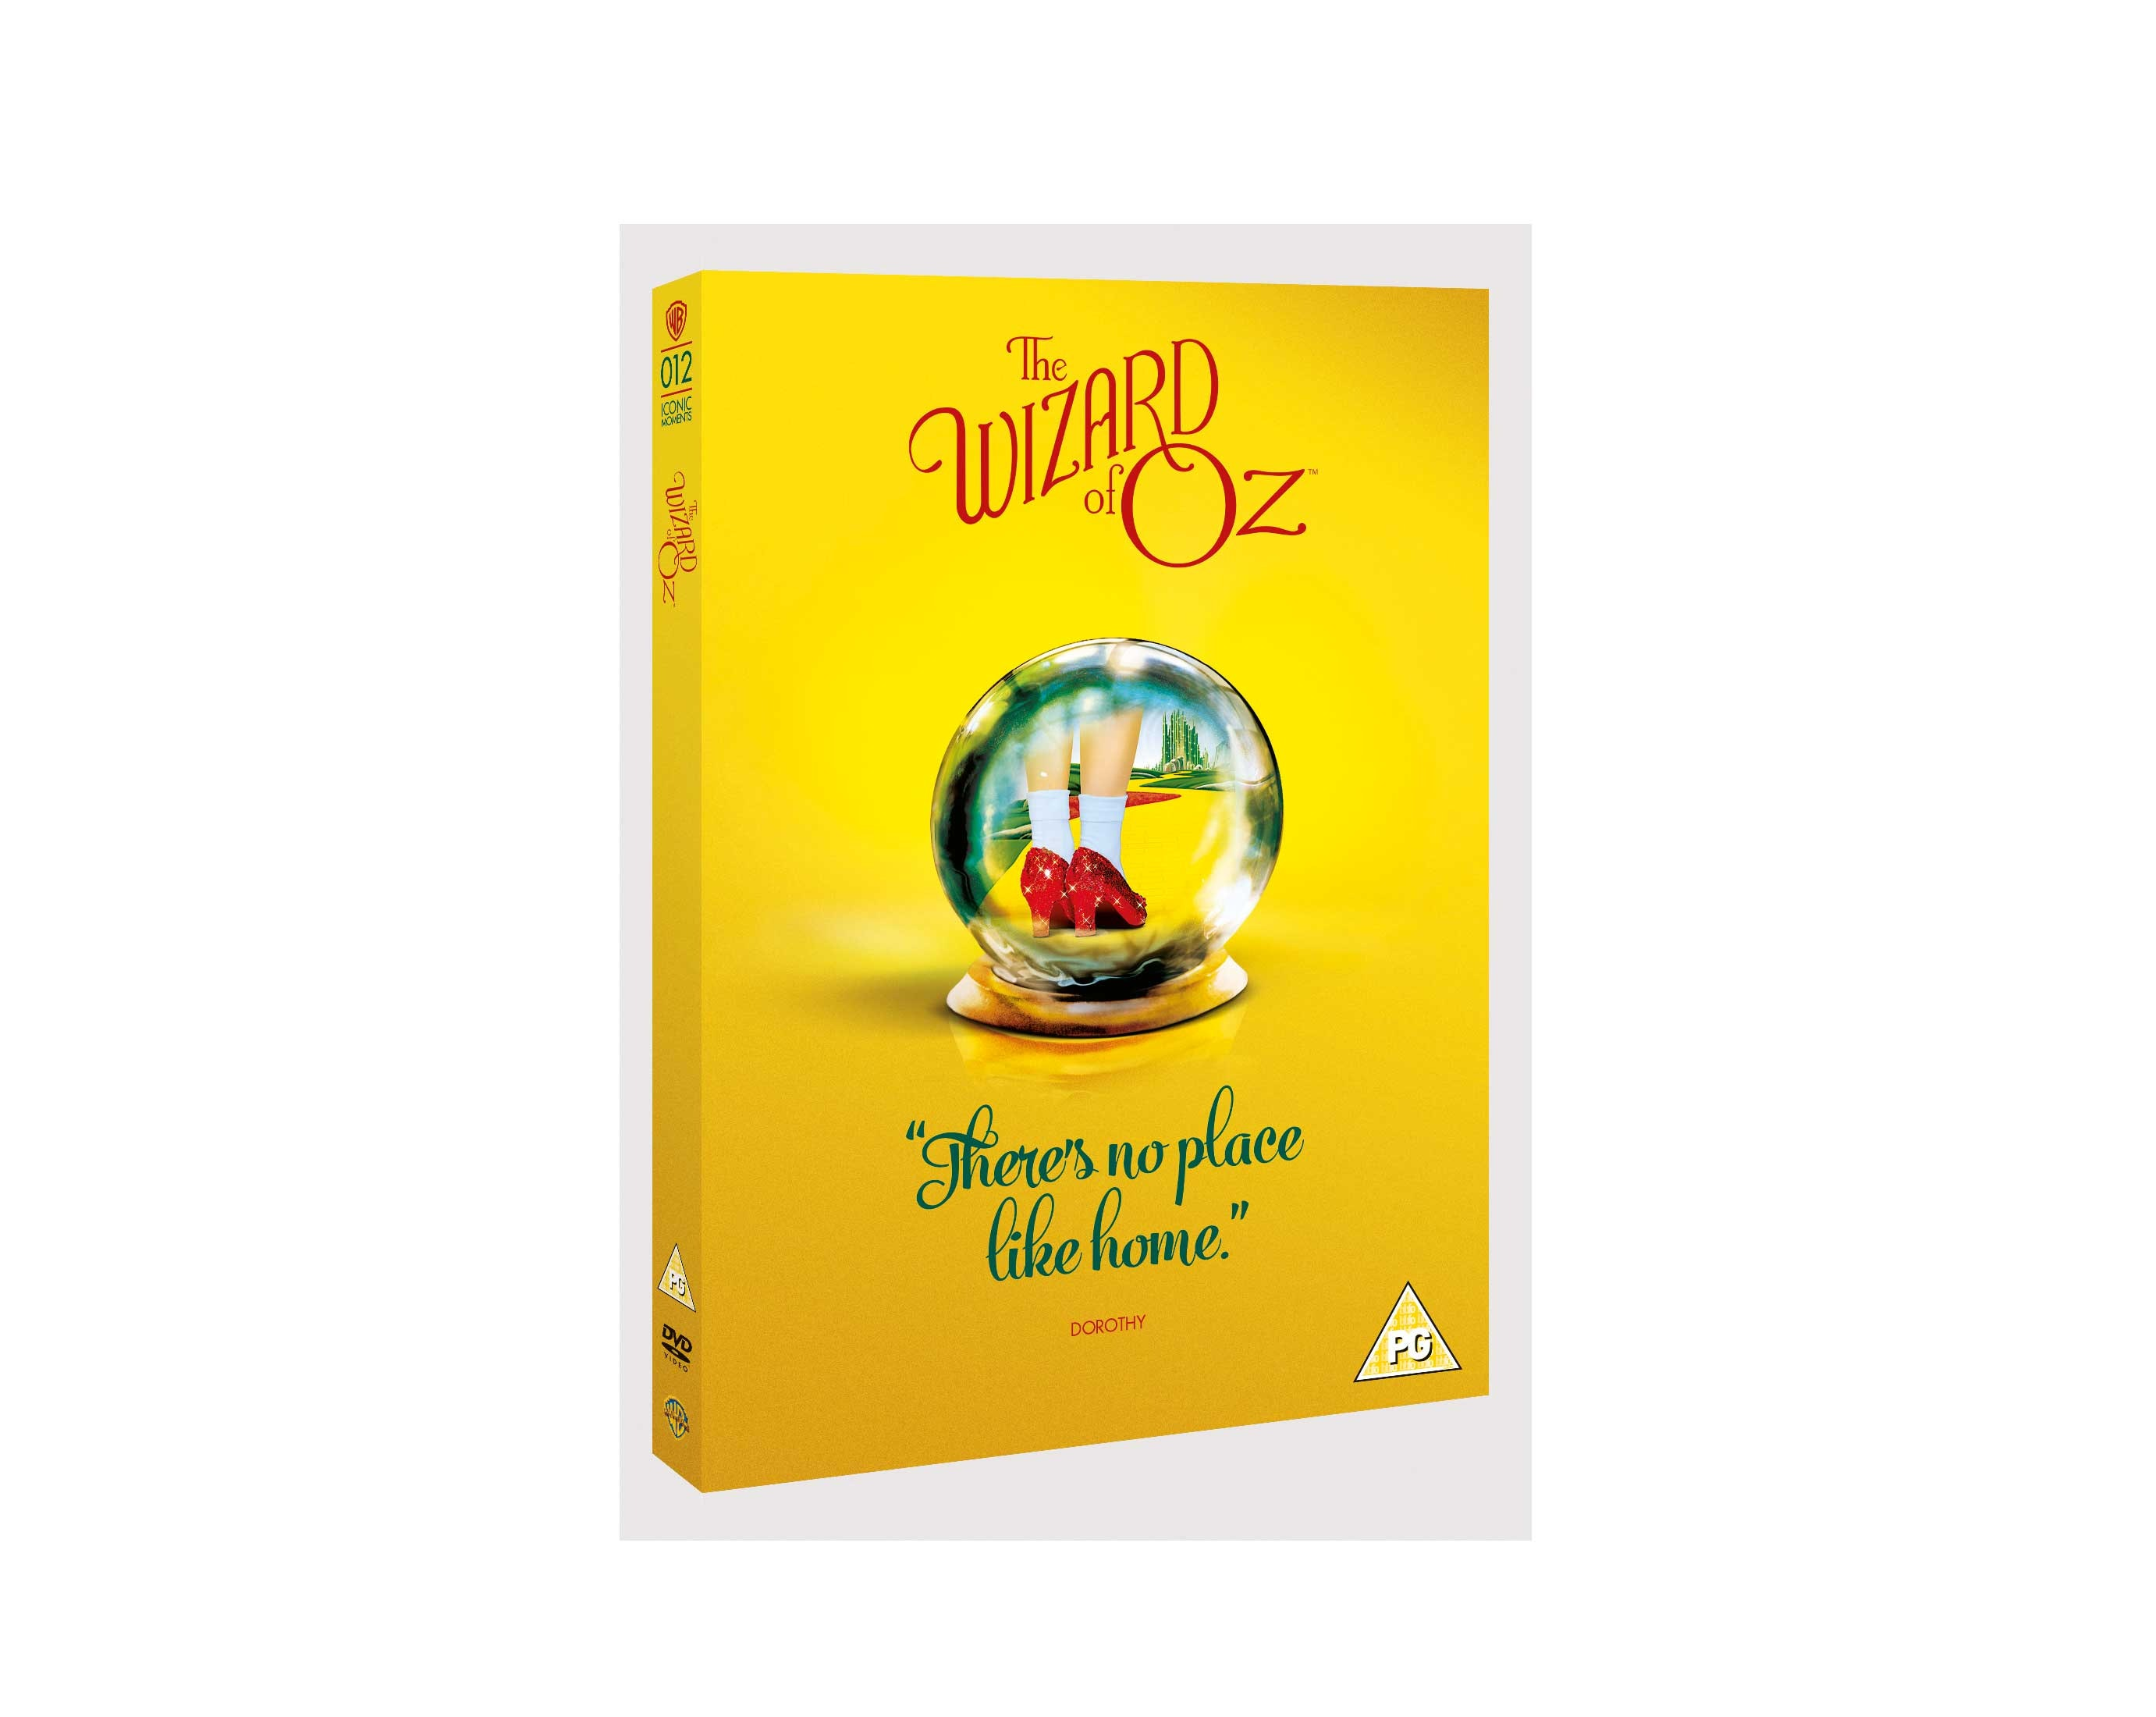 Two sets of Warner Bros DVD bundles sweepstakes